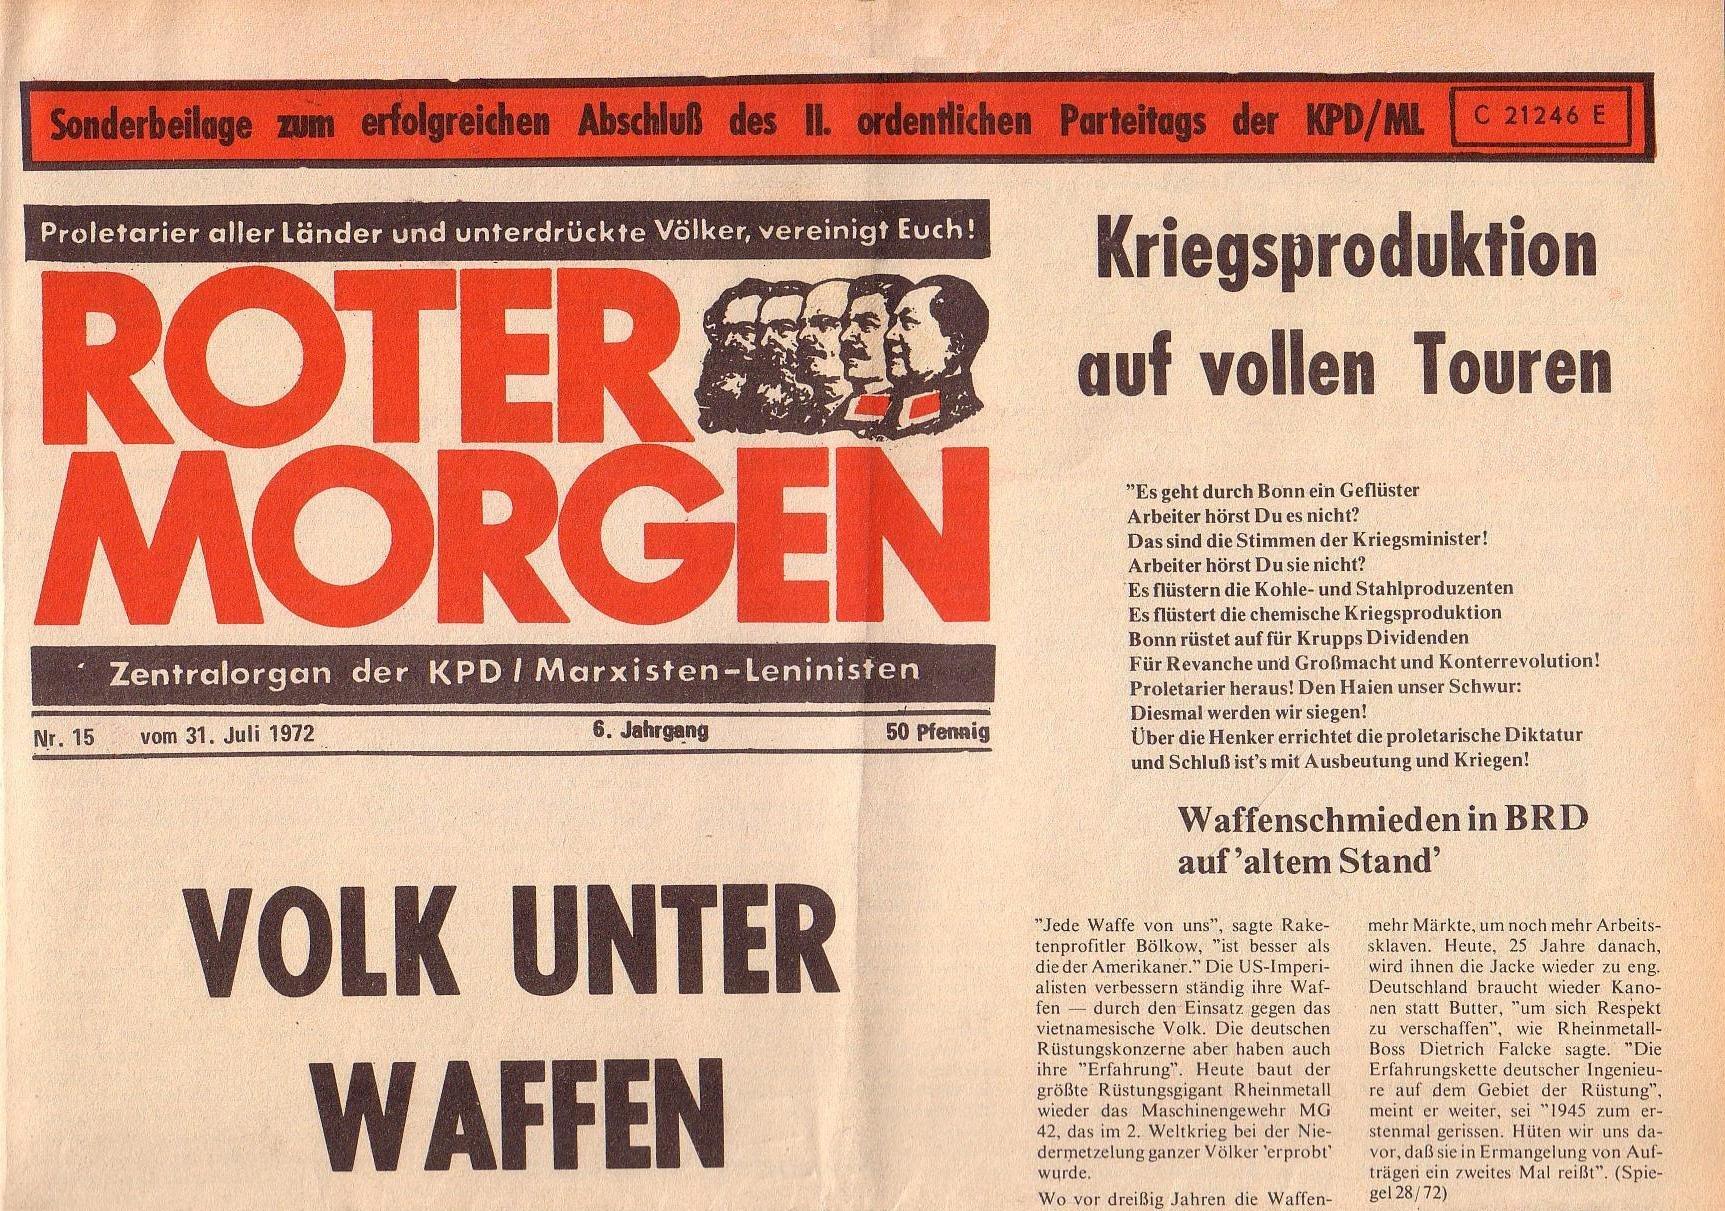 Roter Morgen, 6. Jg., 31. Juli 1972, Nr. 15, Seite 1a